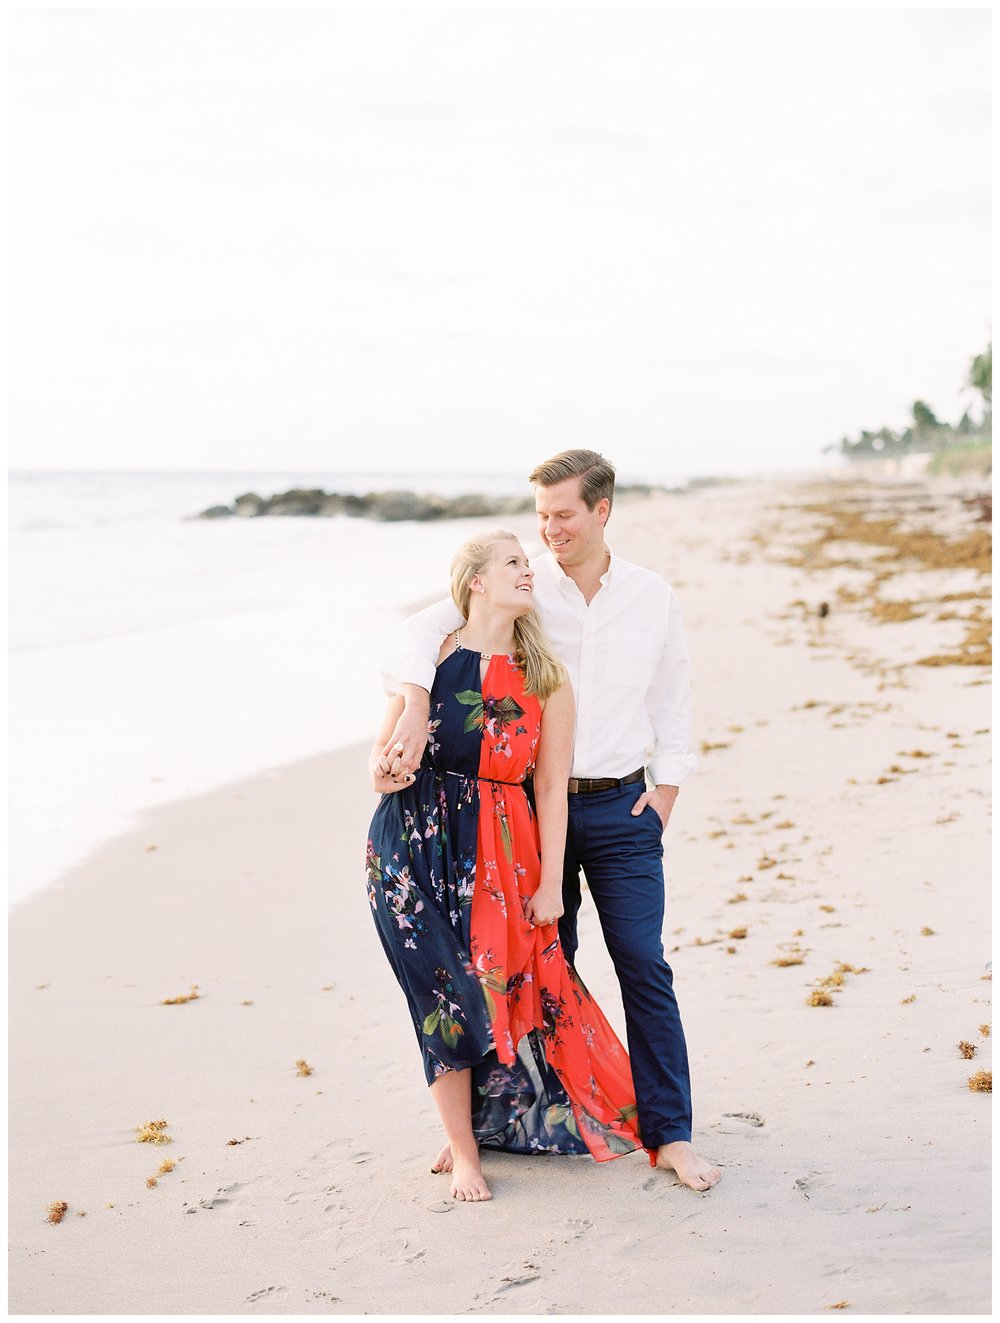 Cosmos Club Wedding | DC Wedding Photographer Kir Tuben_0112.jpg